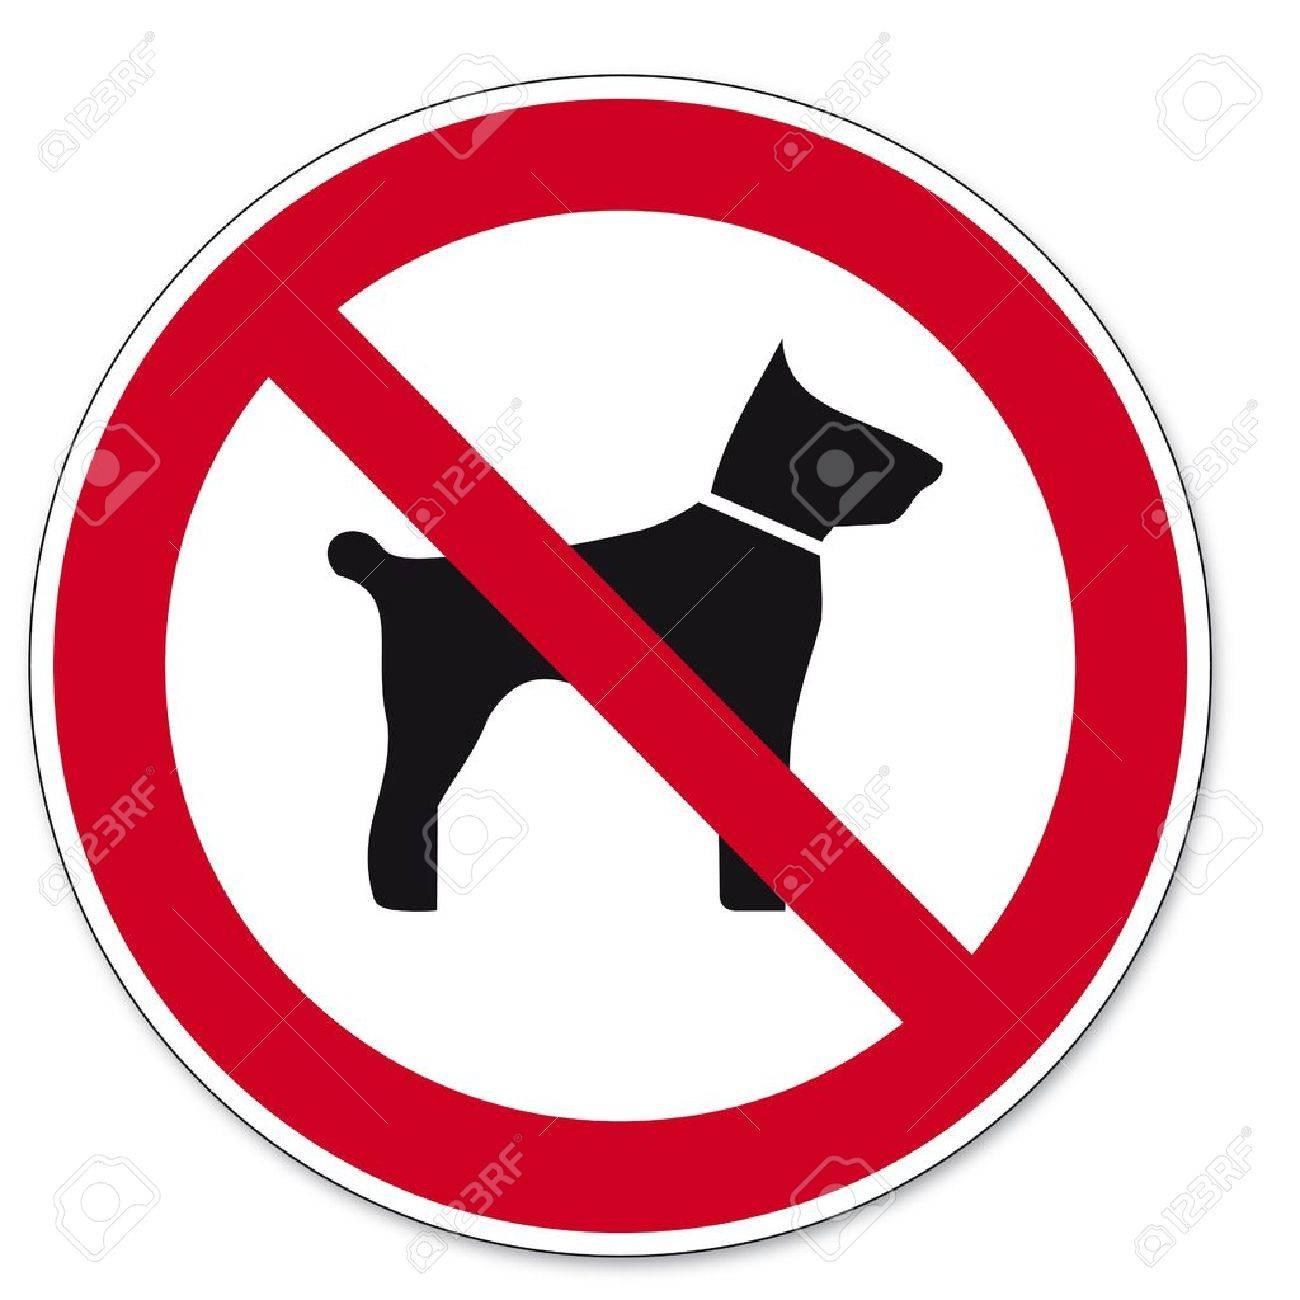 Prohibition signs BGV icon pictogram Carrying animals dog cat - 14460980